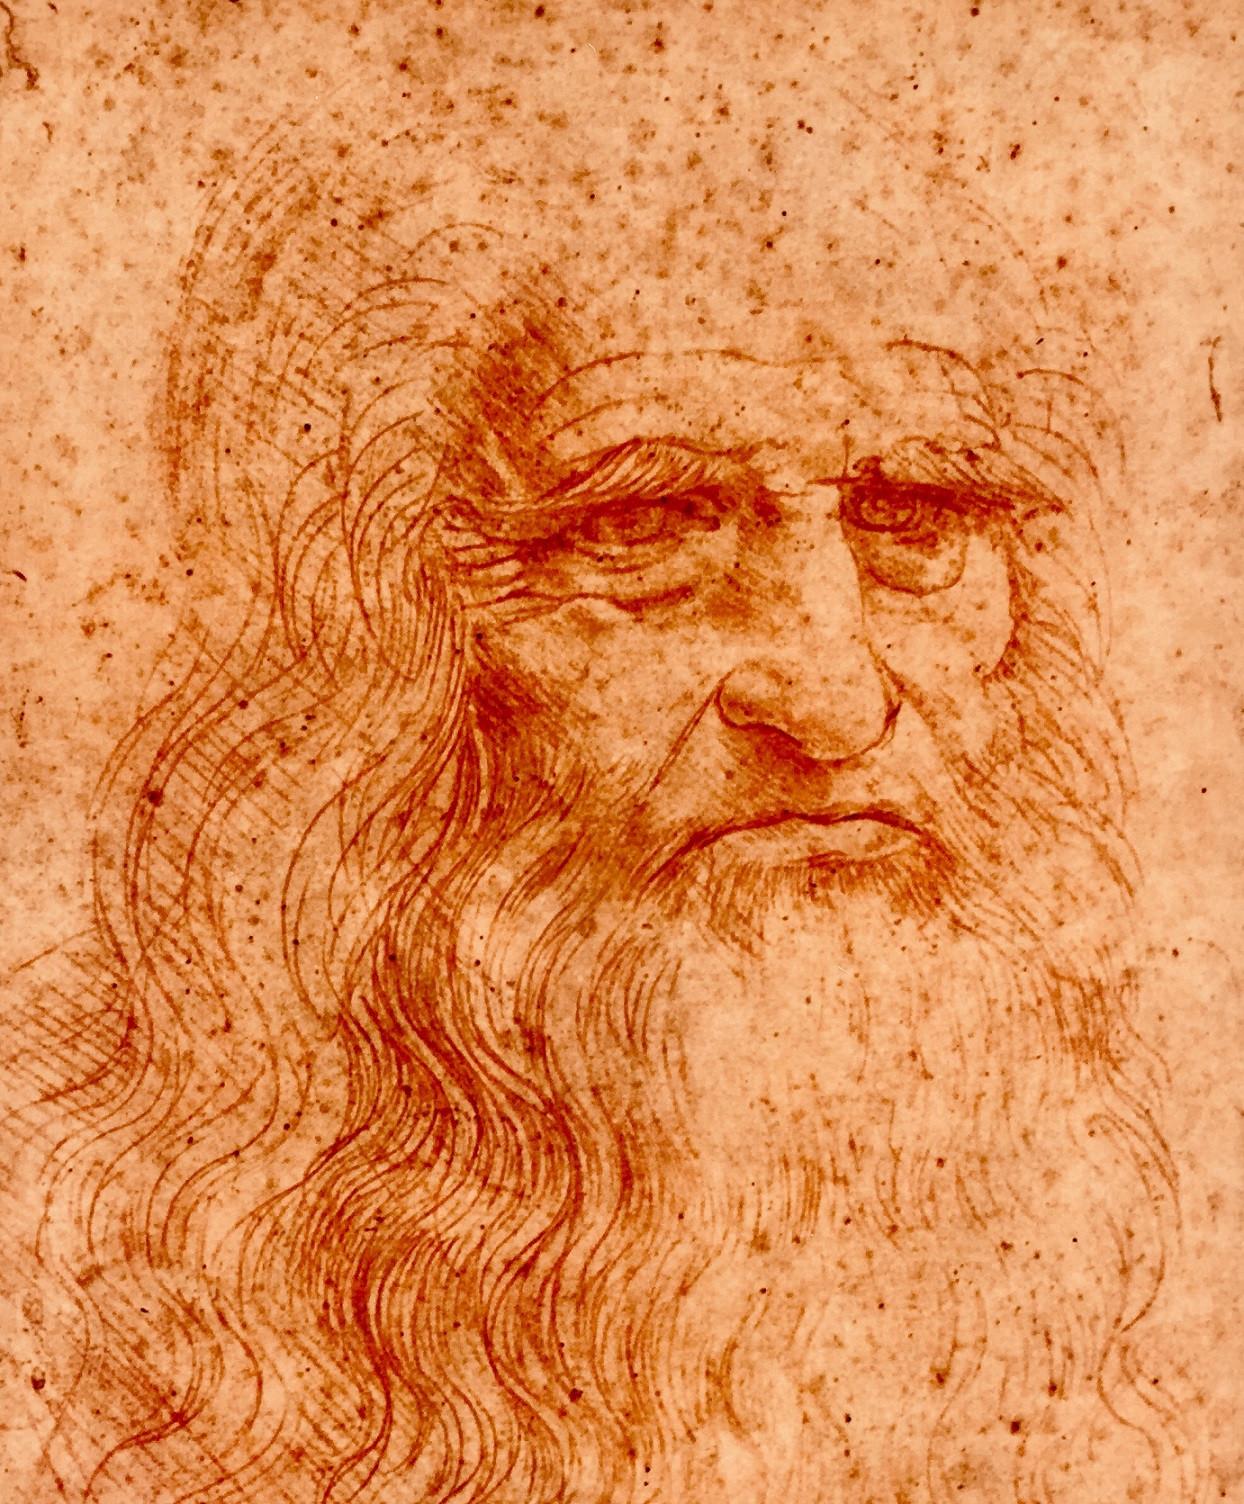 Leonardo da Vinci: Celebrating a 500-year legacy